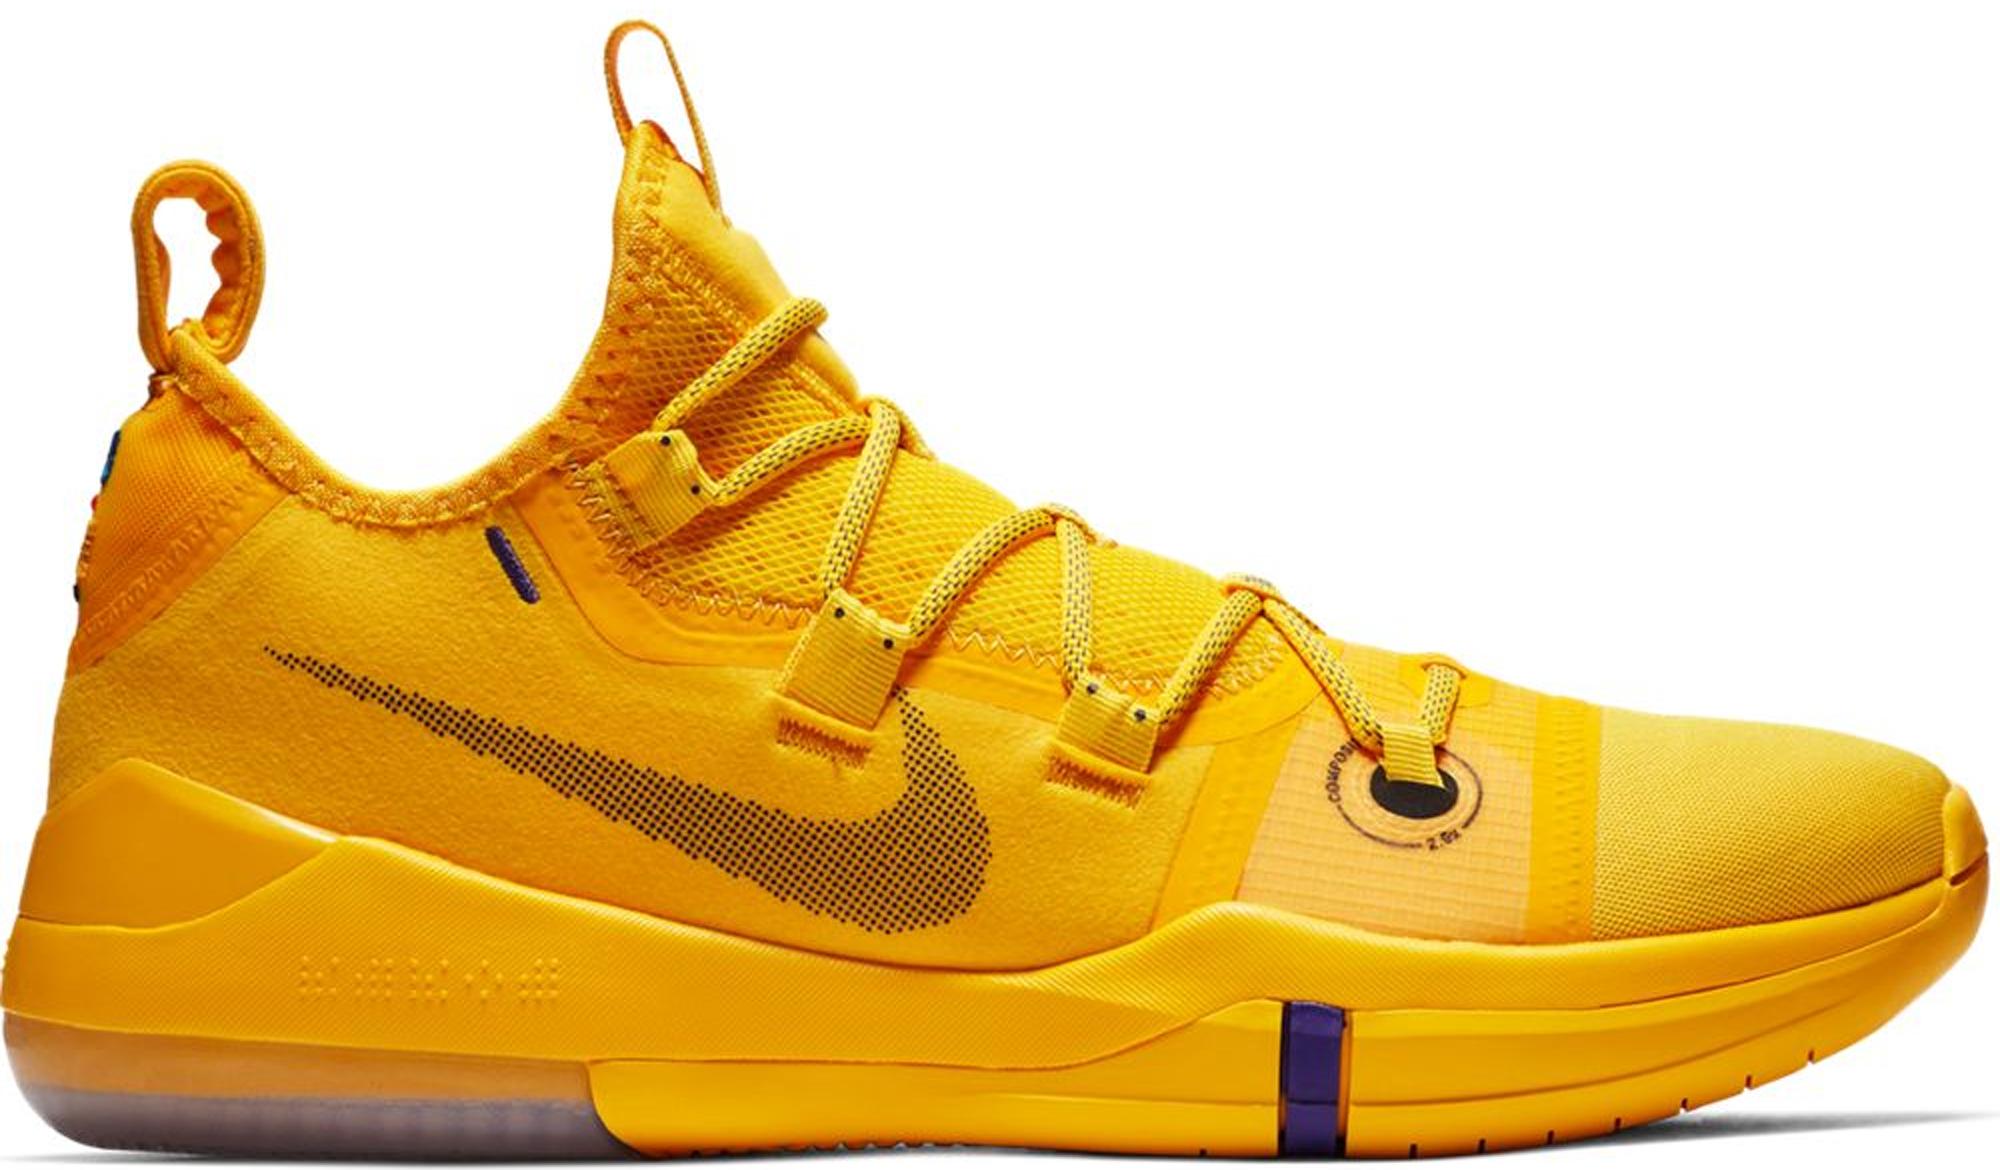 Nike Kobe AD Lakers Amarillo - AR5515-700